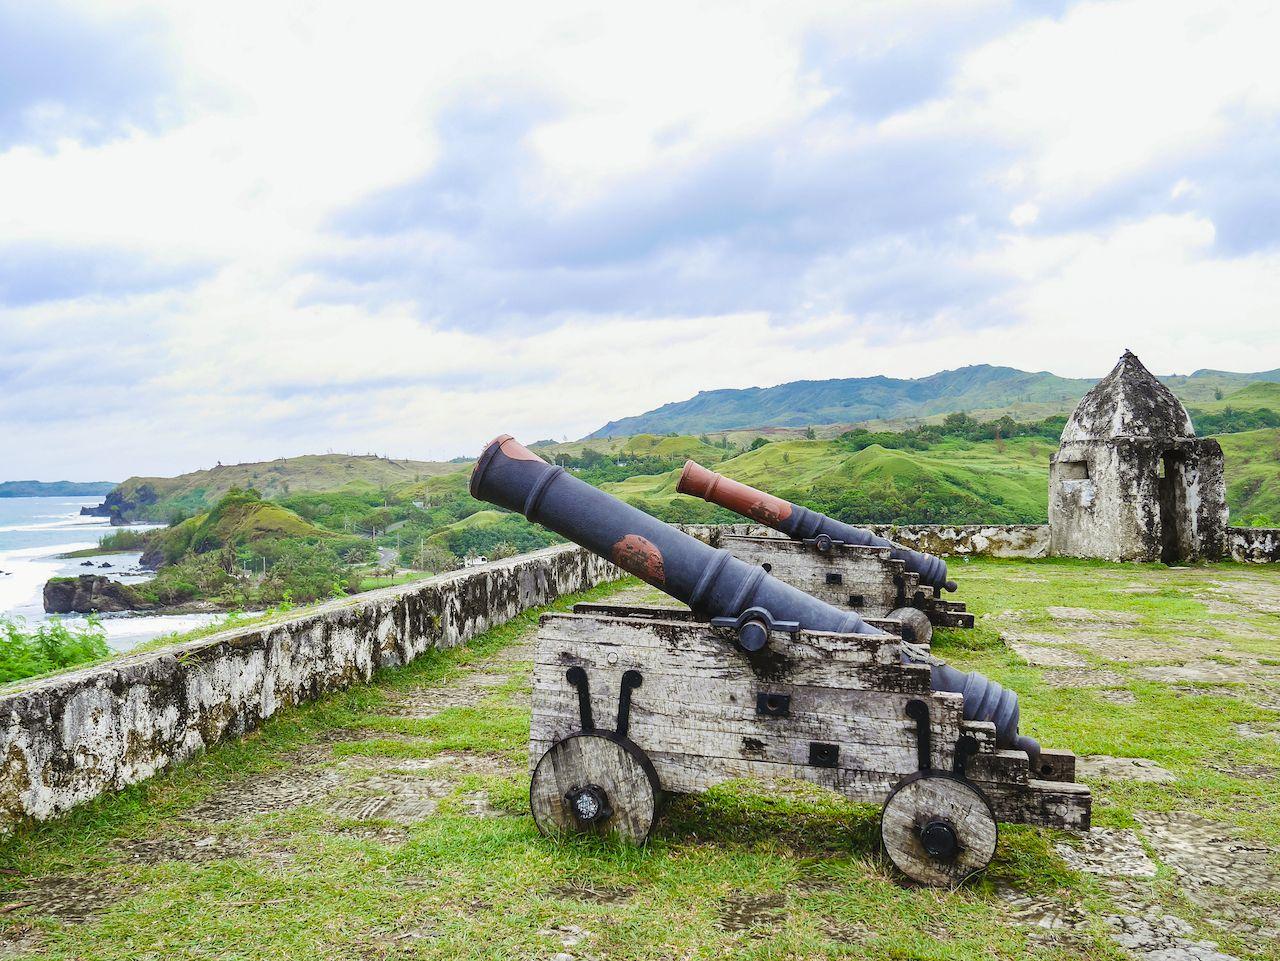 Fort Nuestra, Guam